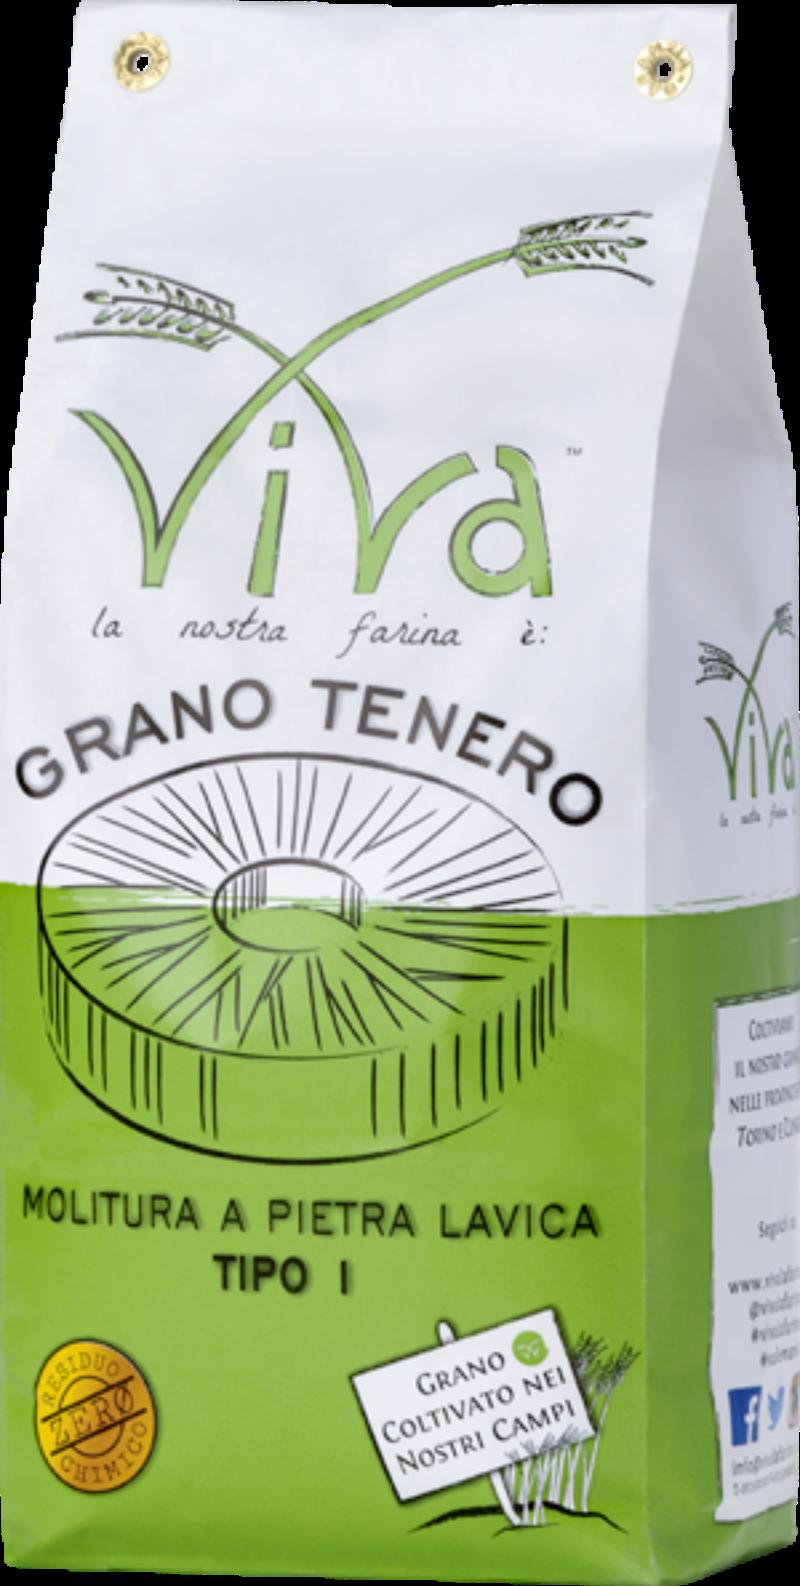 GRANO-TENERO-PACK-1-KG